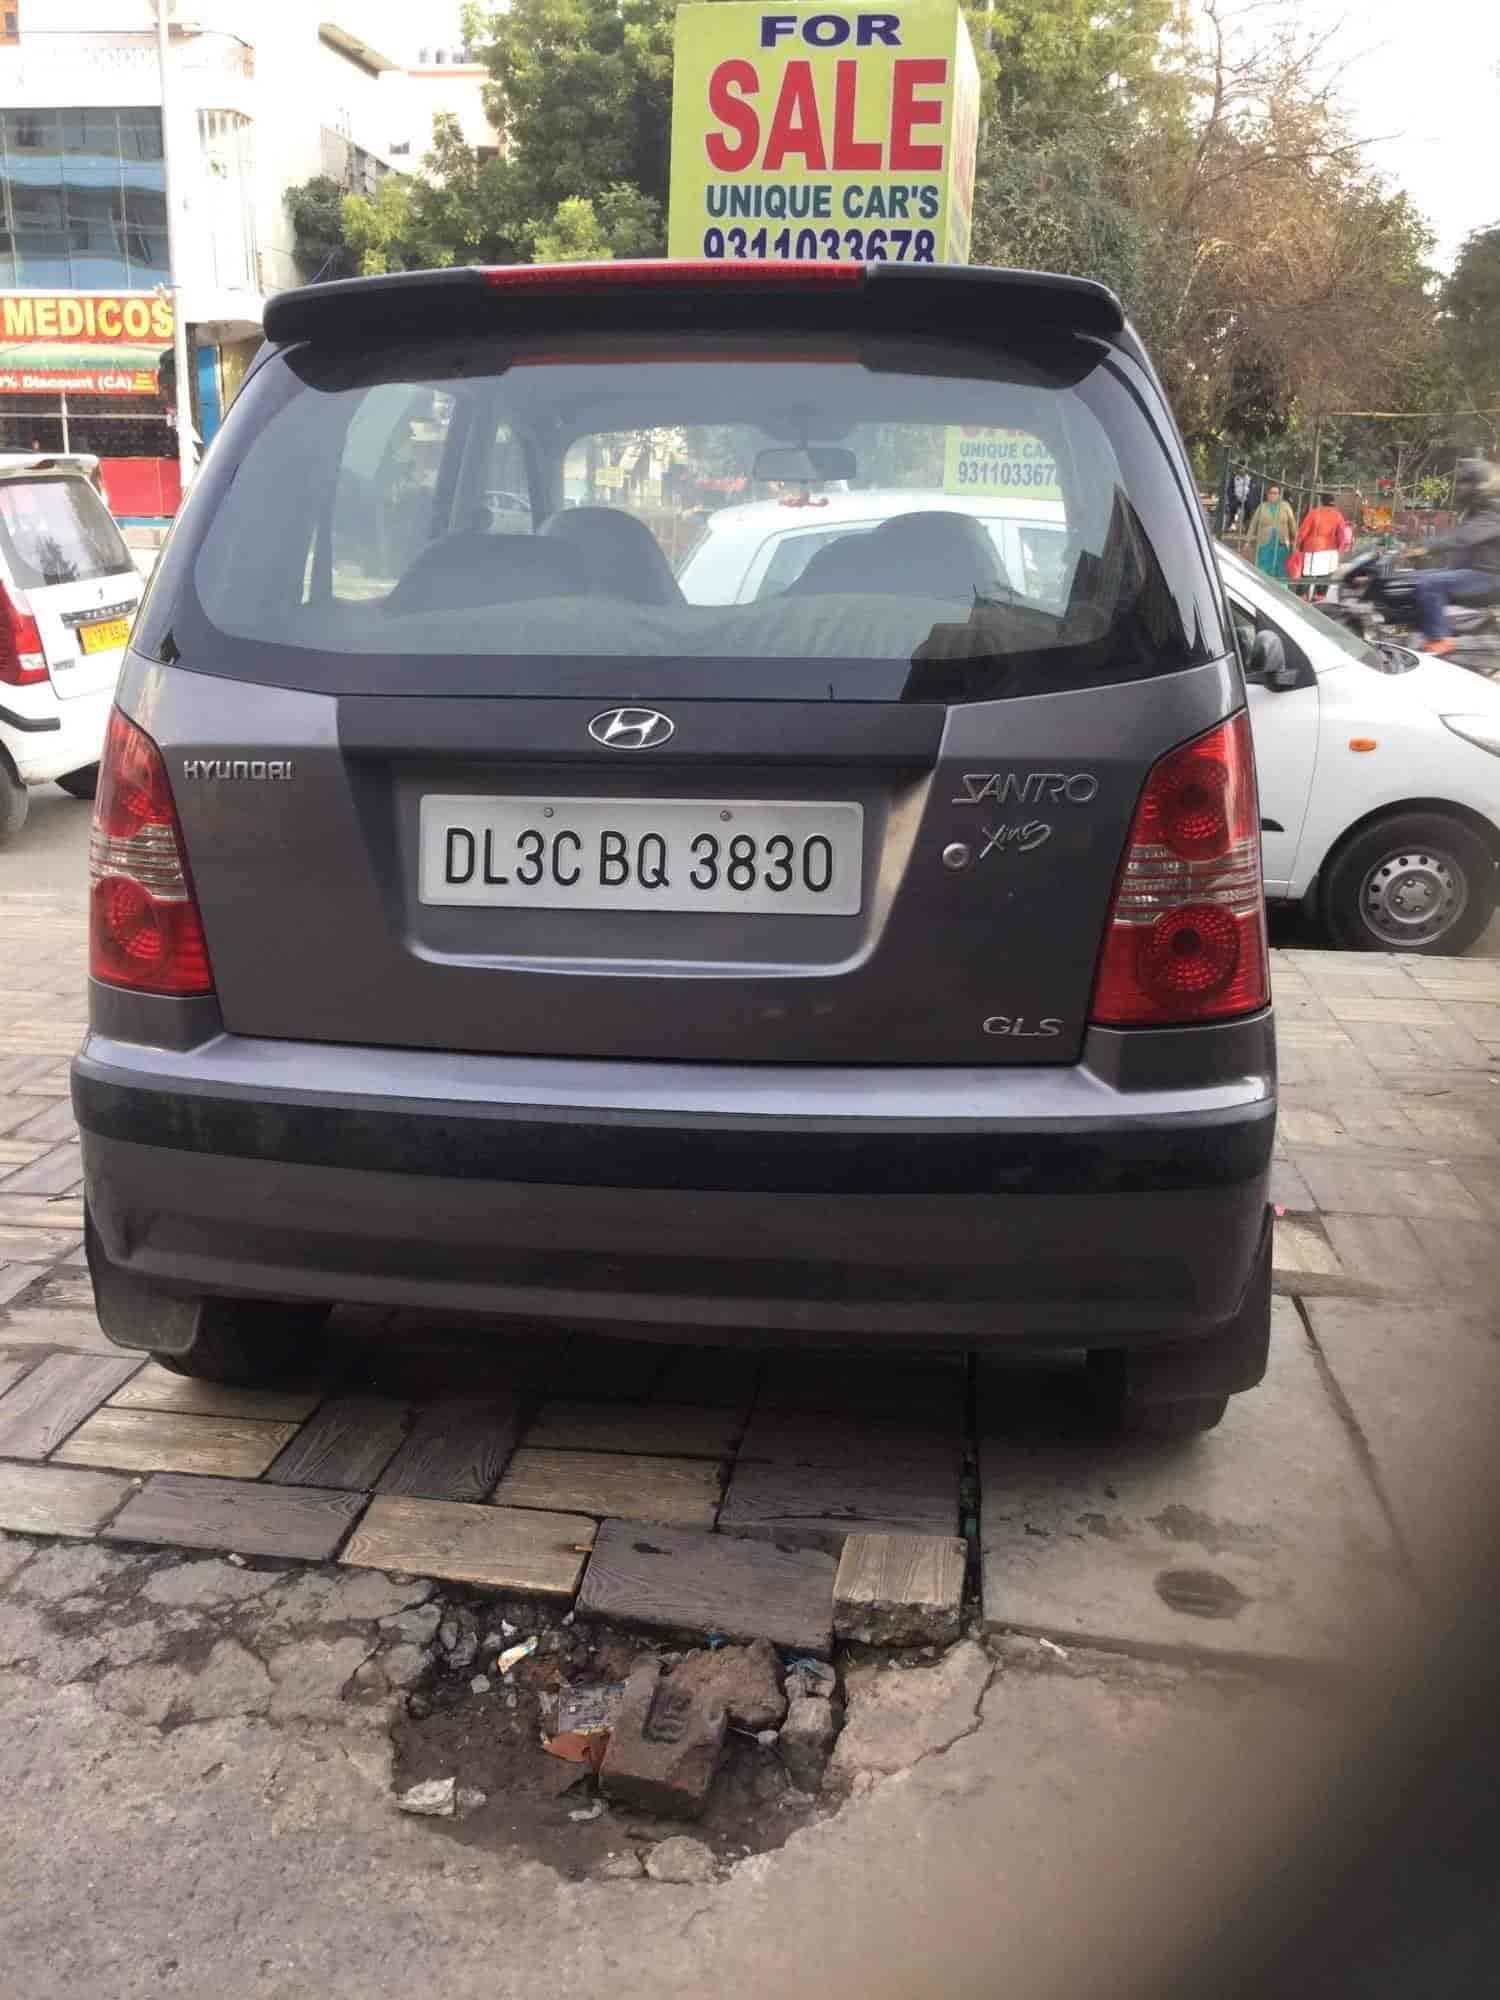 Unique Cars Photos, Rohini Sector 5, Delhi-NCR- Pictures & Images ...